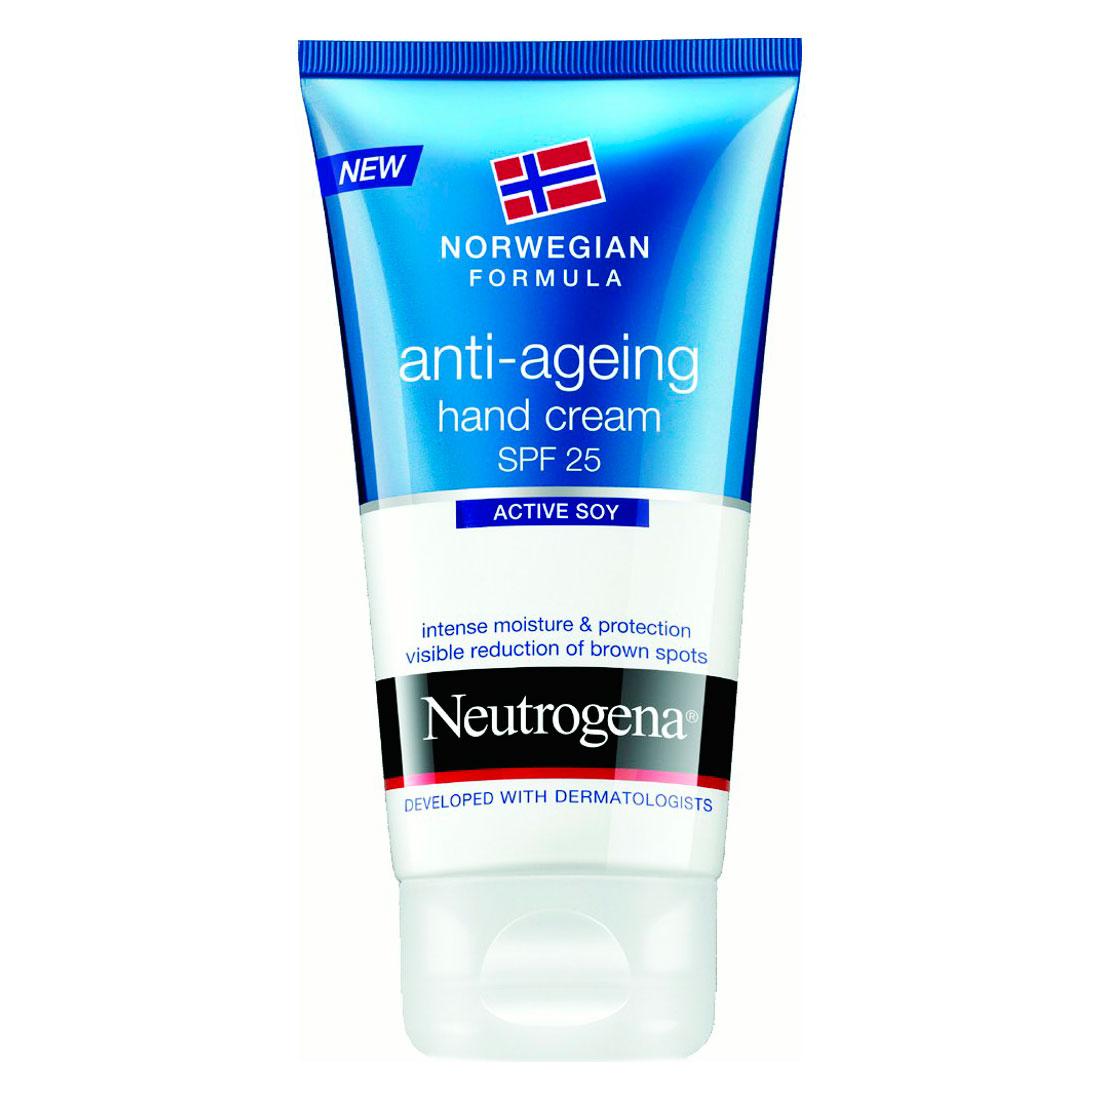 ���� ��� ��� Neutrogena ���������� ������� �������������� 50 ��